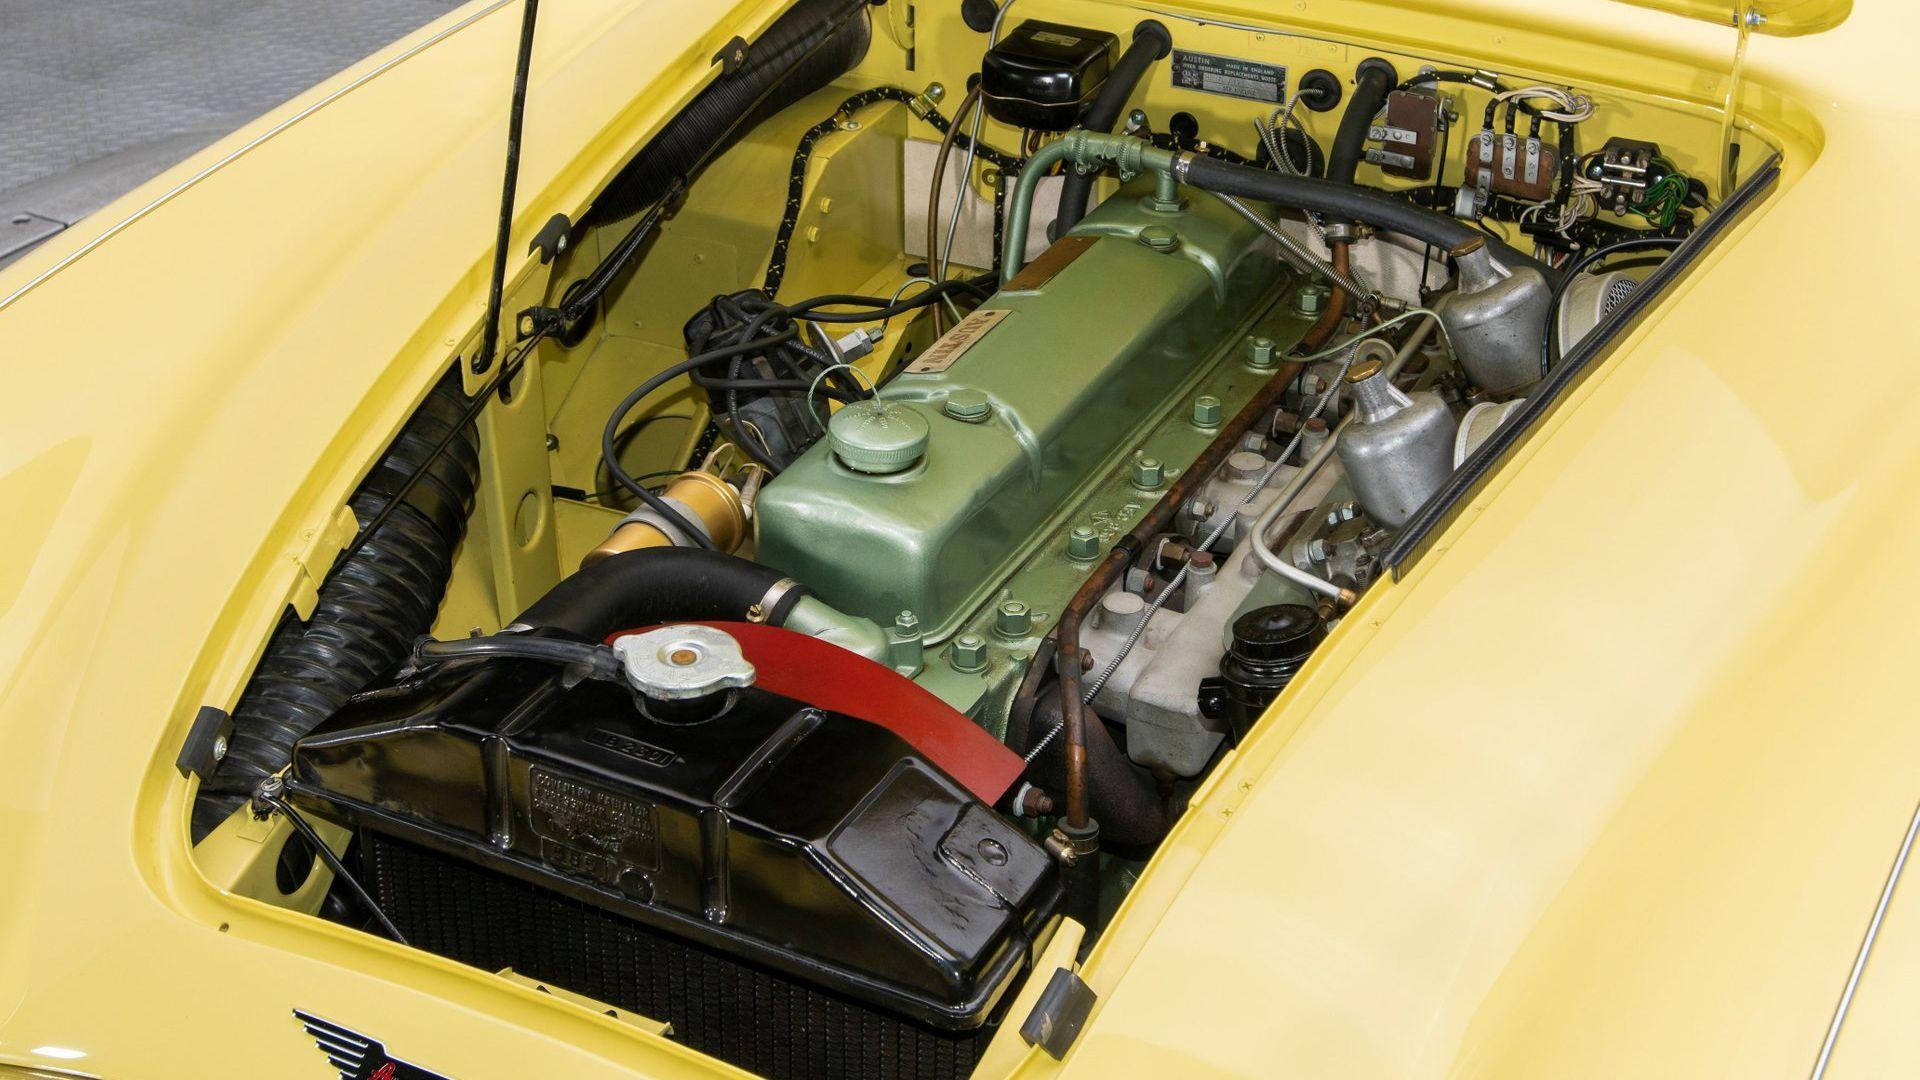 Rotisserie-Restored 1959 Austin-Healey 3000 Mark I BN7 Seeks Open Roads